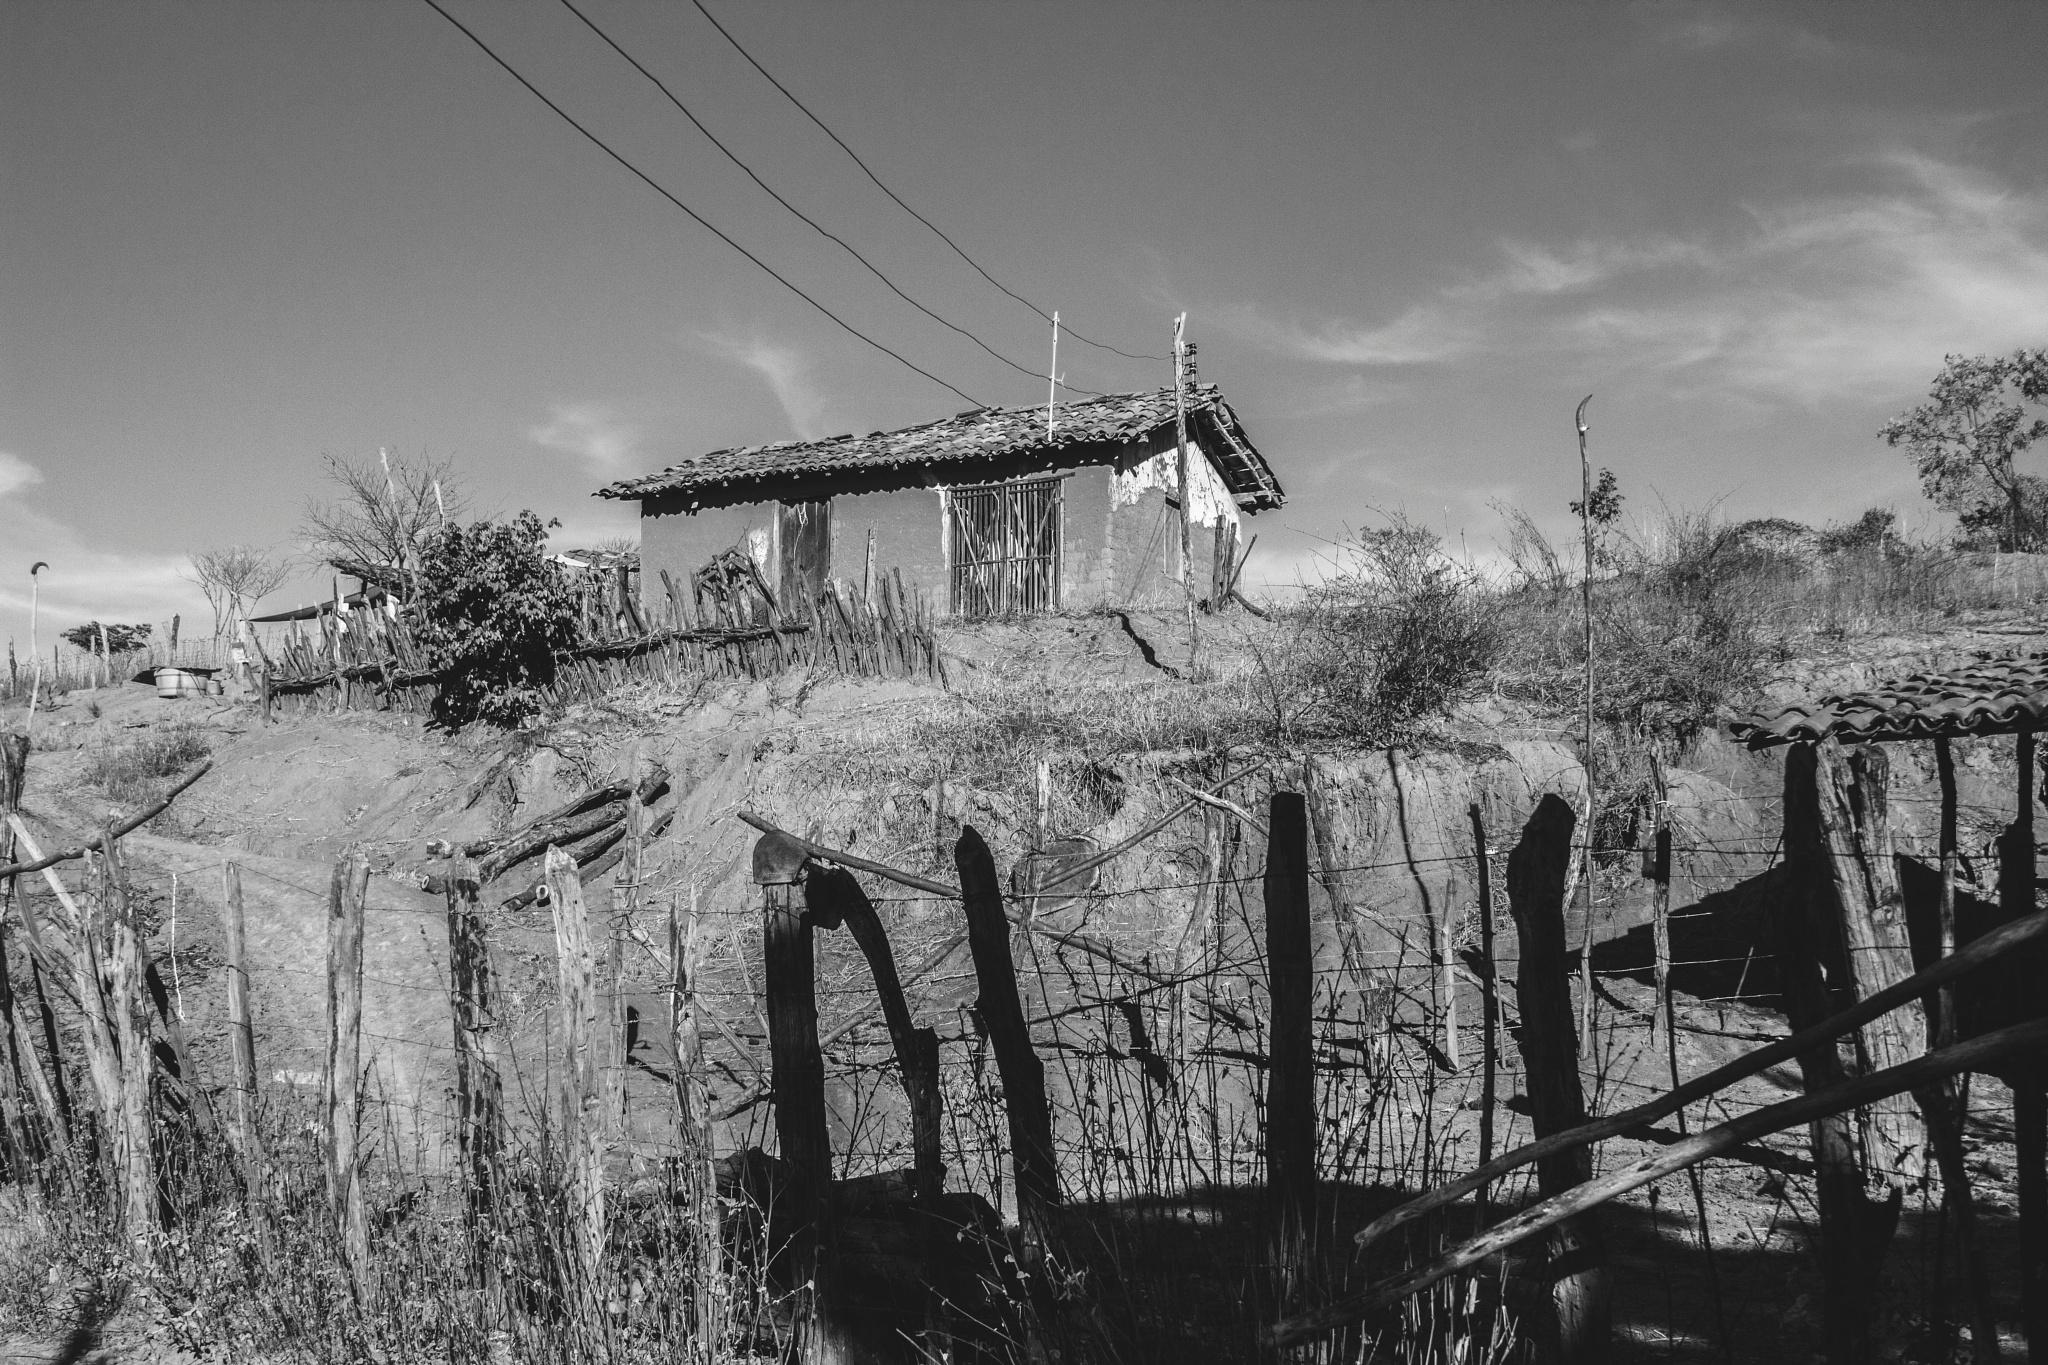 Casa de pau a pic .. by kbelo